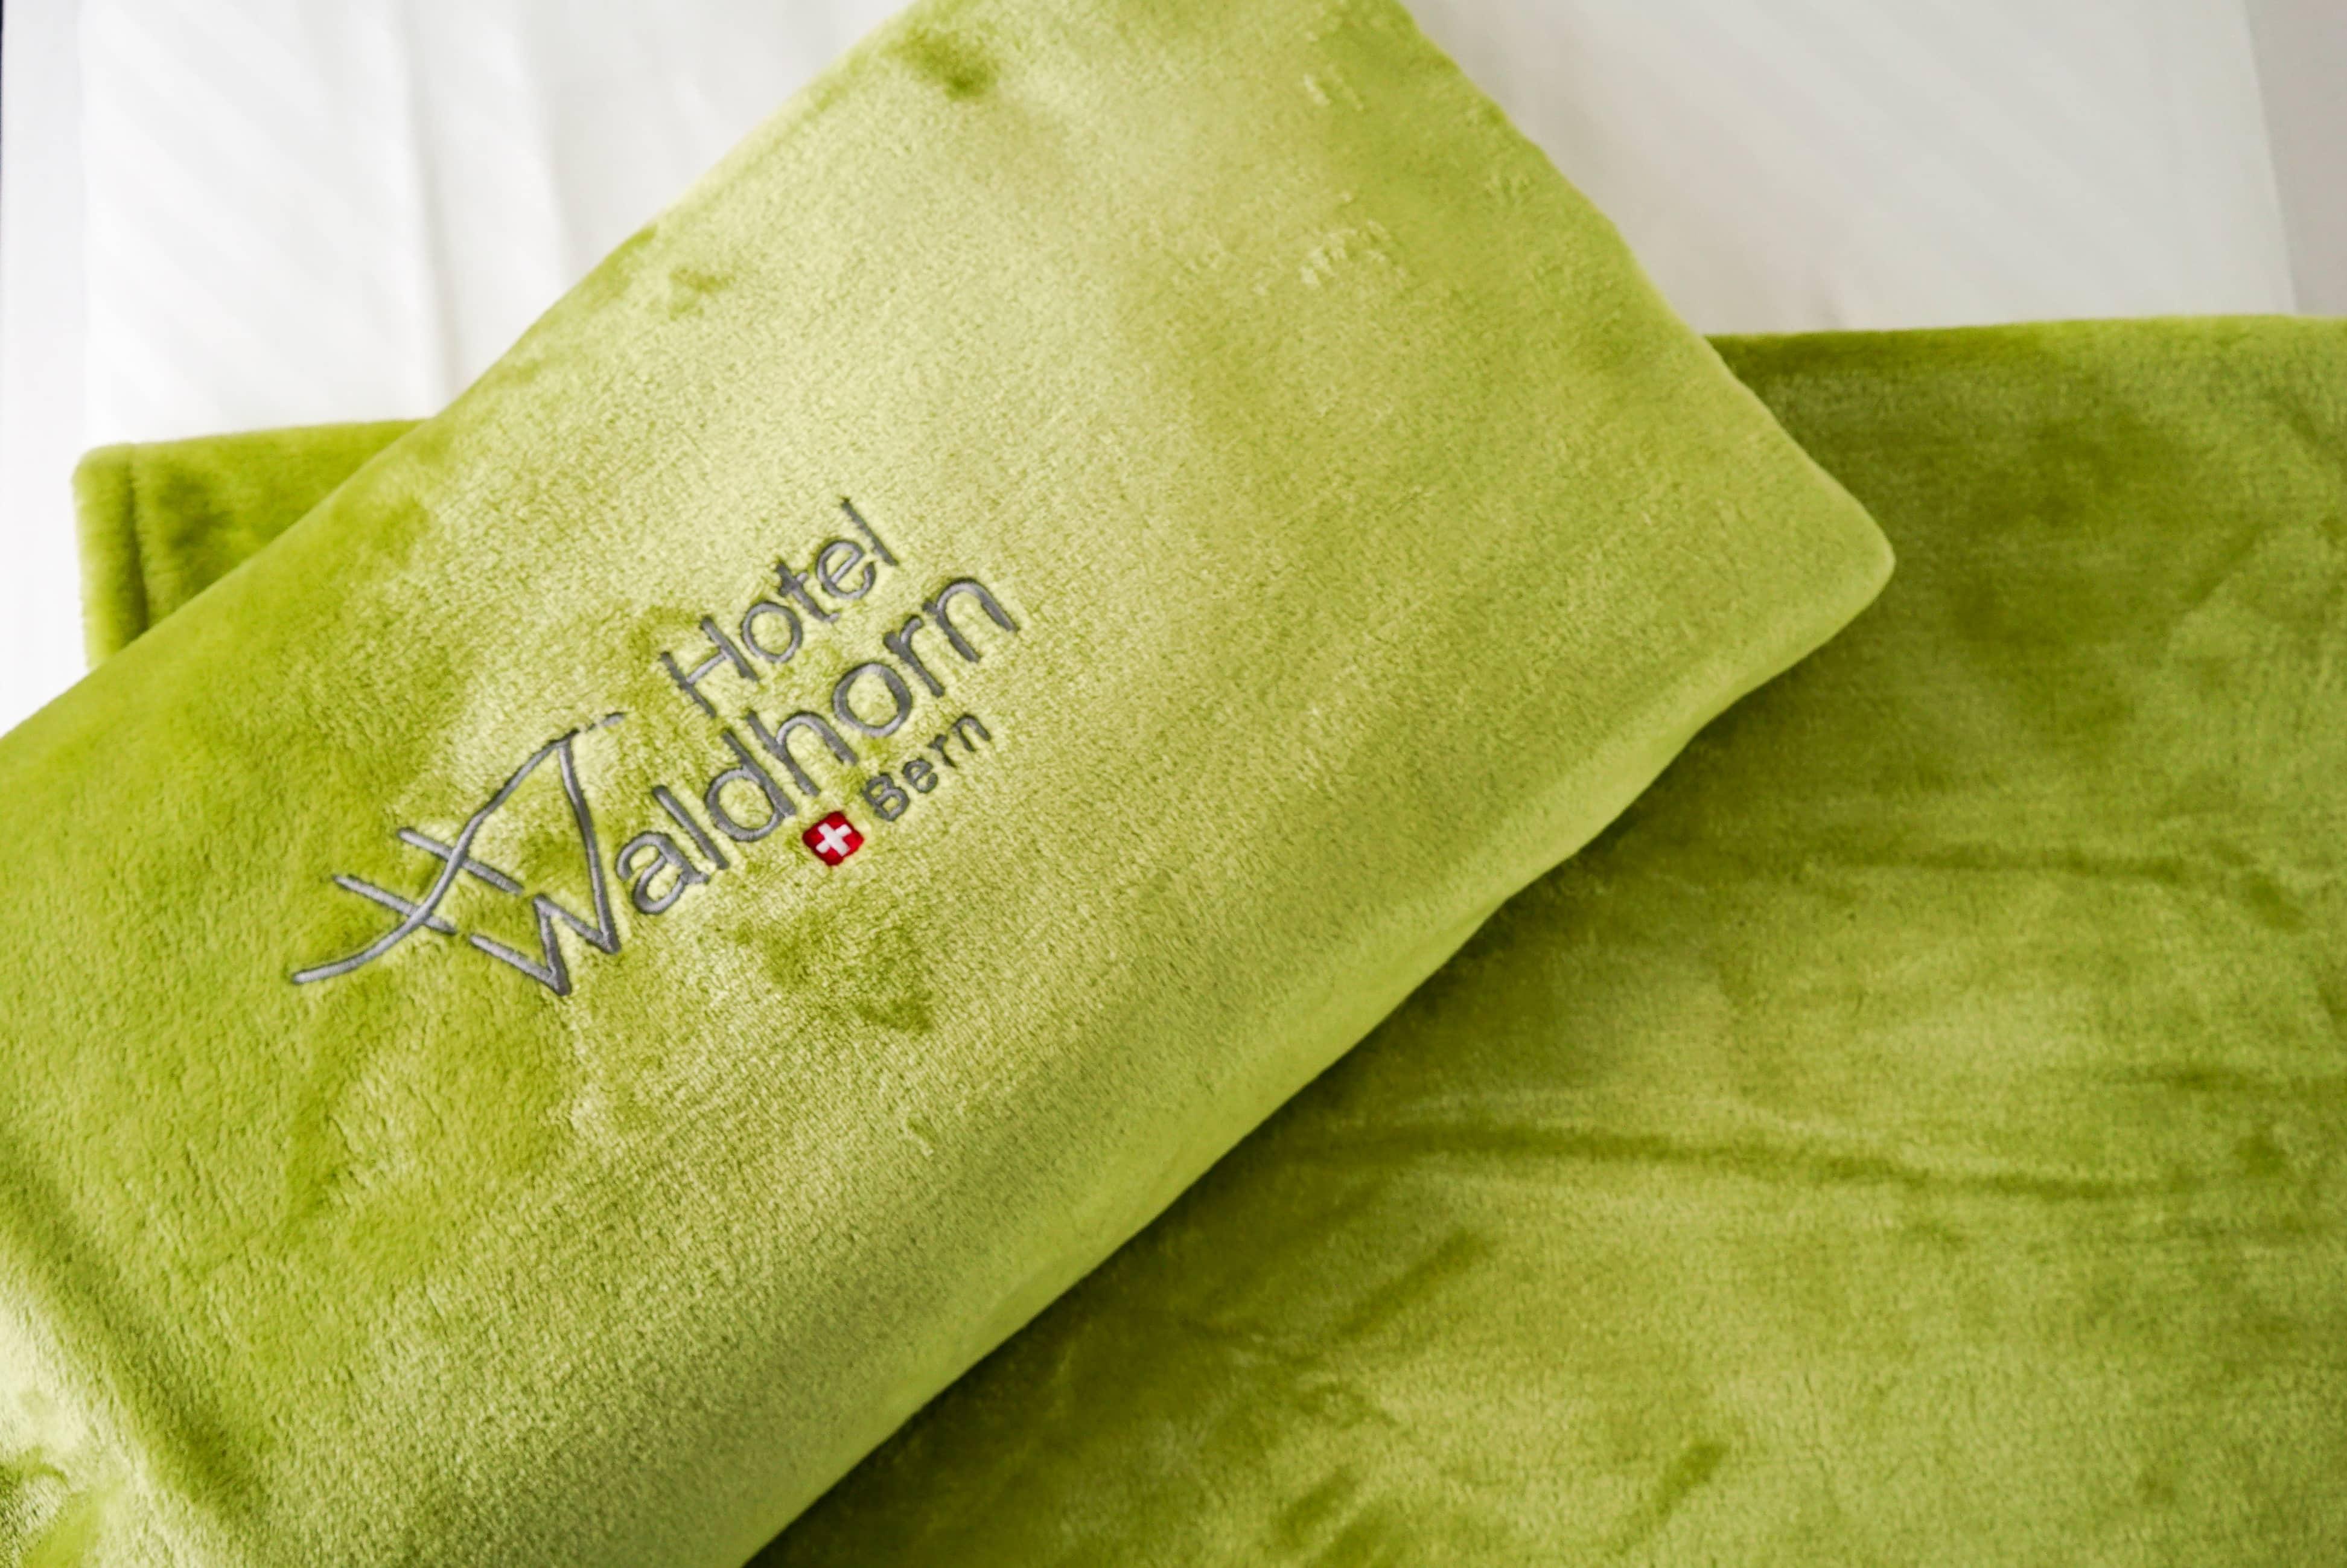 https://www.waldhorn.ch/wp-content/uploads/2016/03/Waldhorn-8.jpg